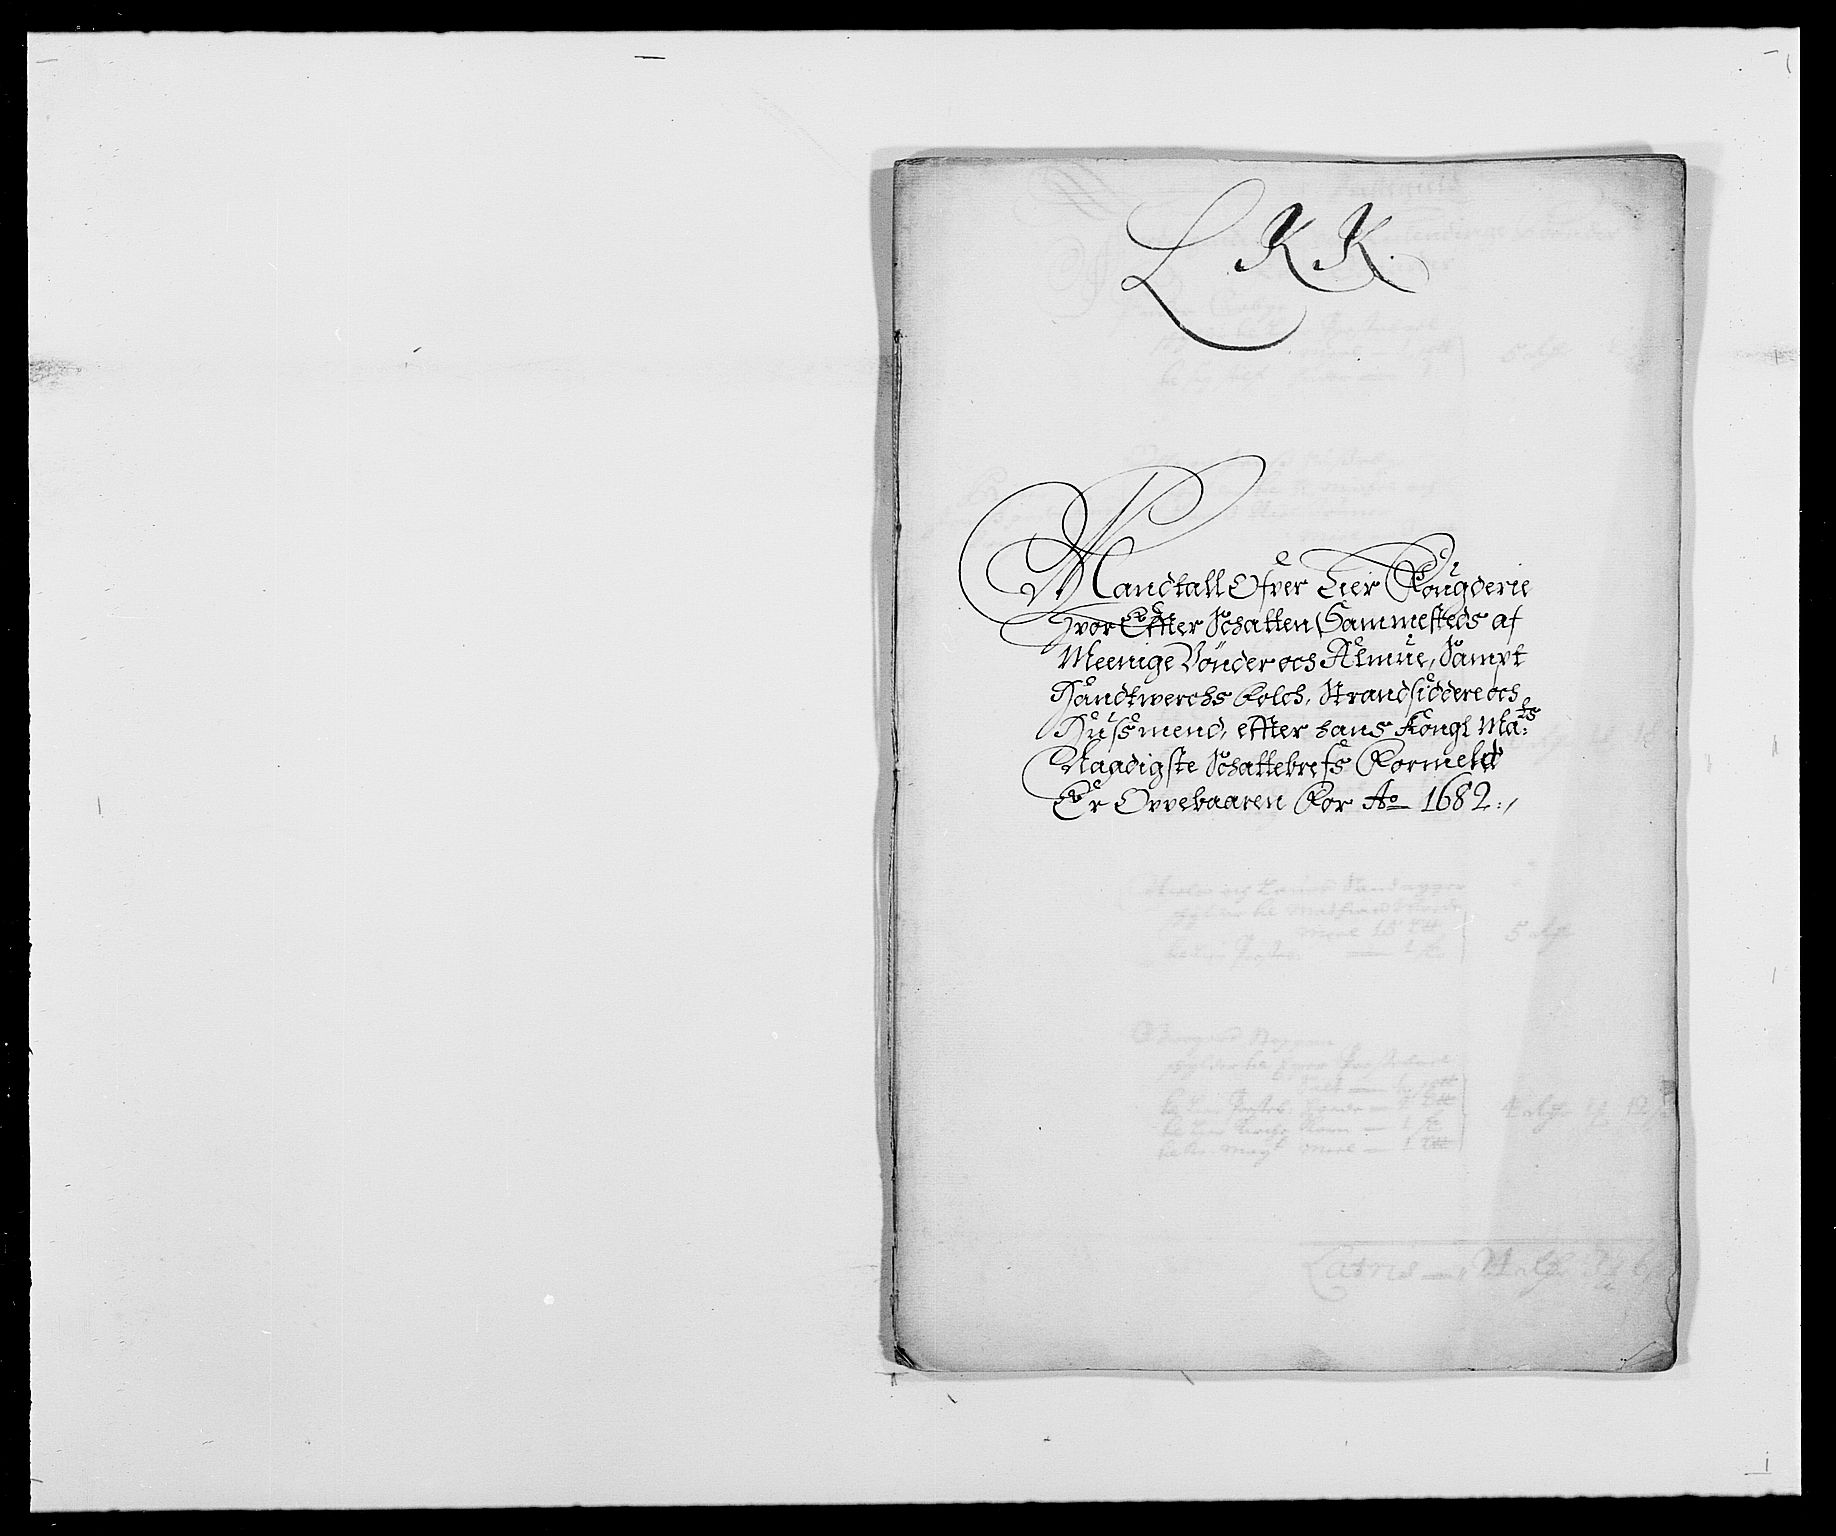 RA, Rentekammeret inntil 1814, Reviderte regnskaper, Fogderegnskap, R27/L1686: Fogderegnskap Lier, 1678-1686, s. 382